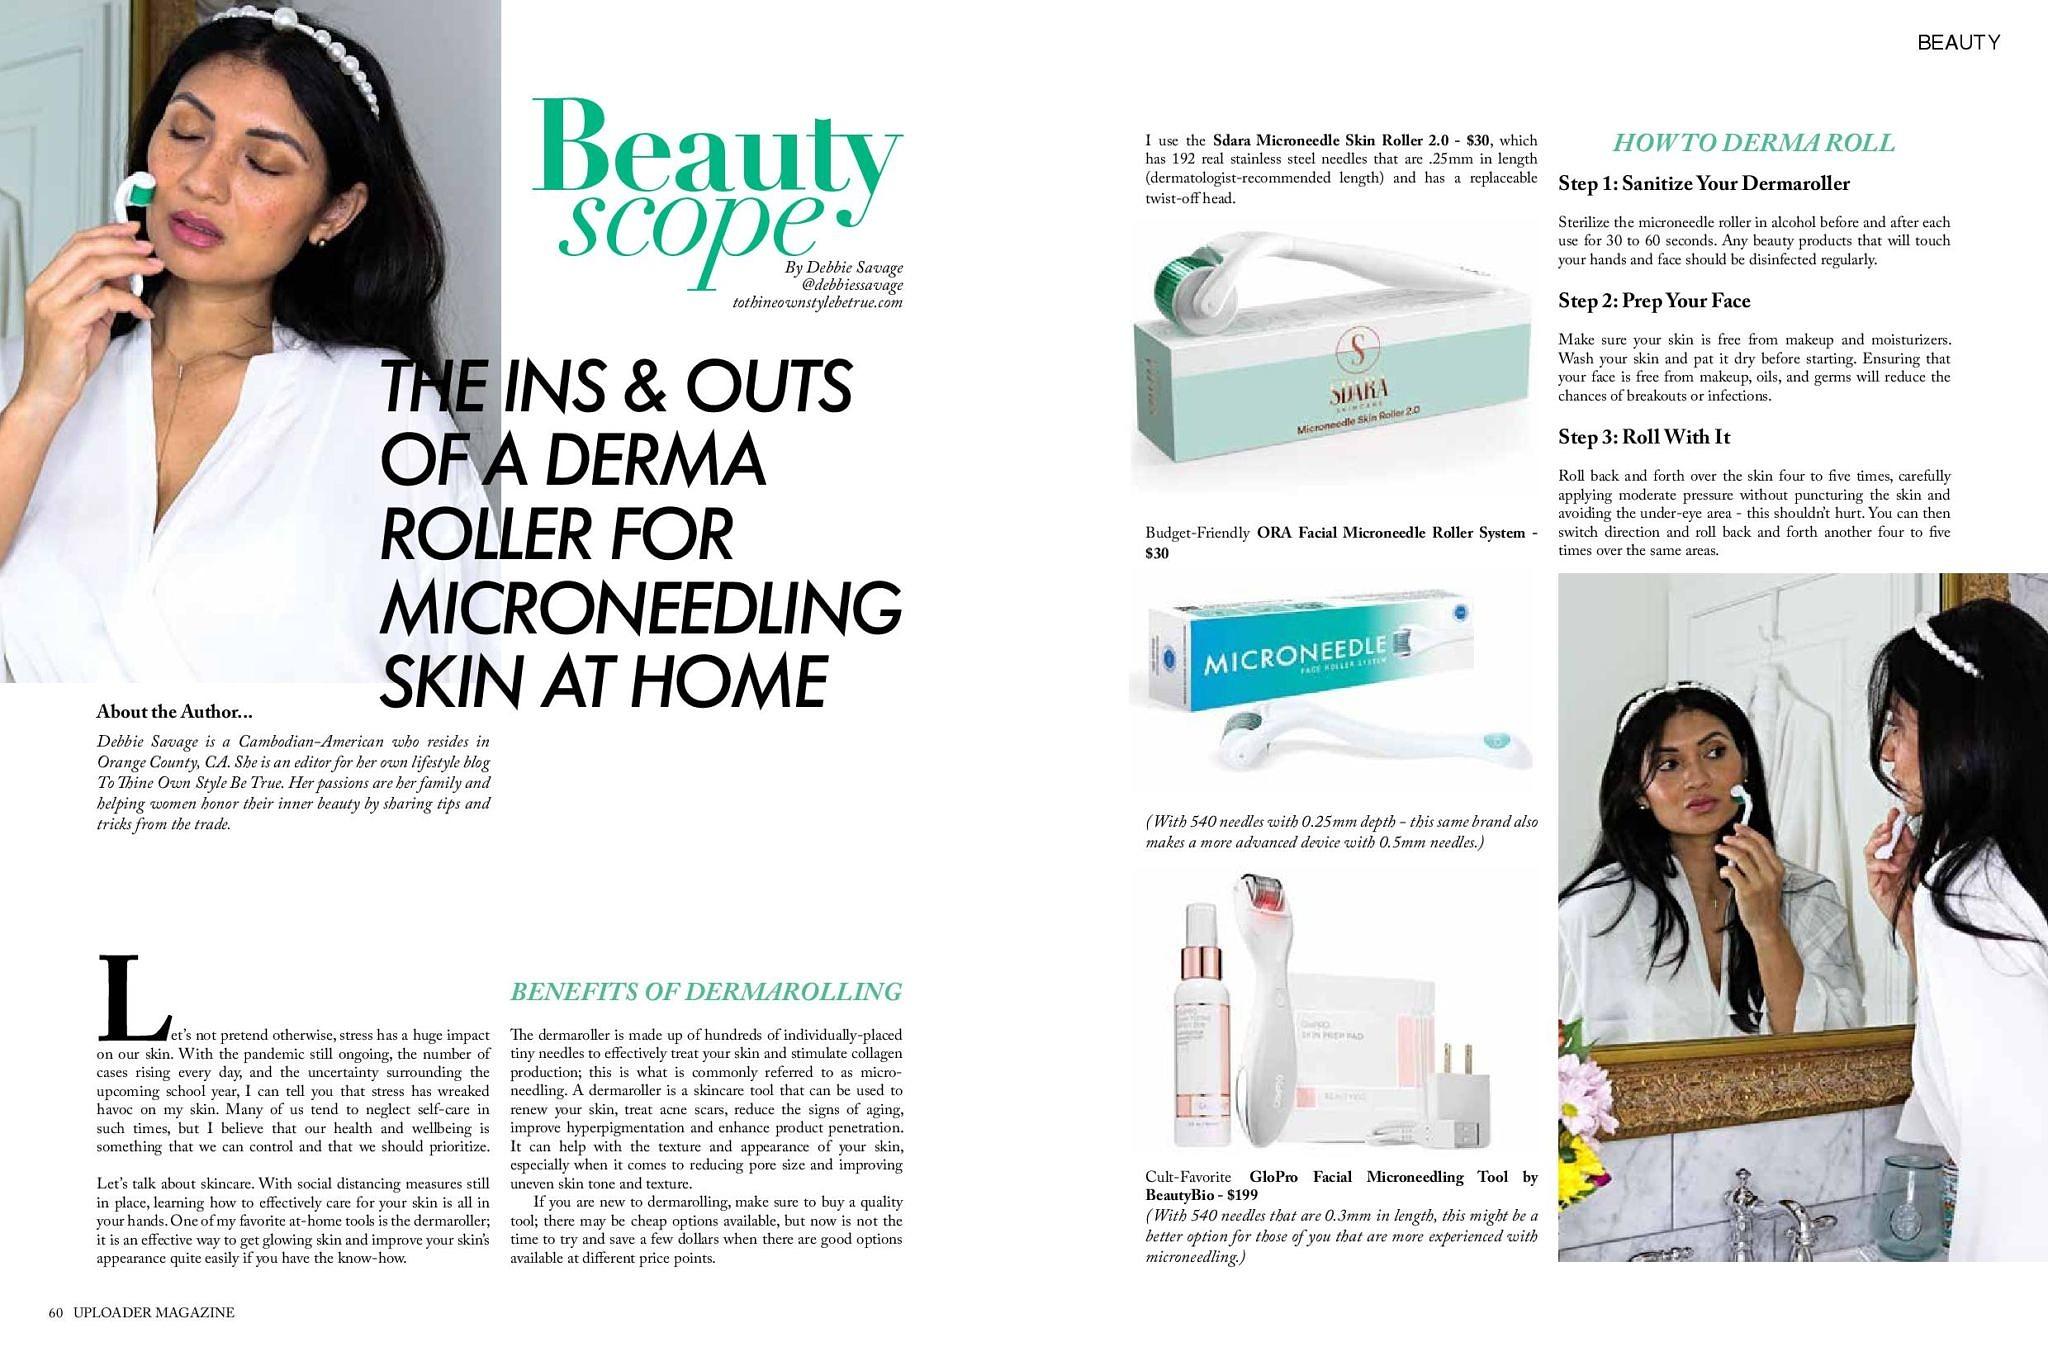 Debbie Savage Blog_Uploader Magazine August 2020 Beauty Scope